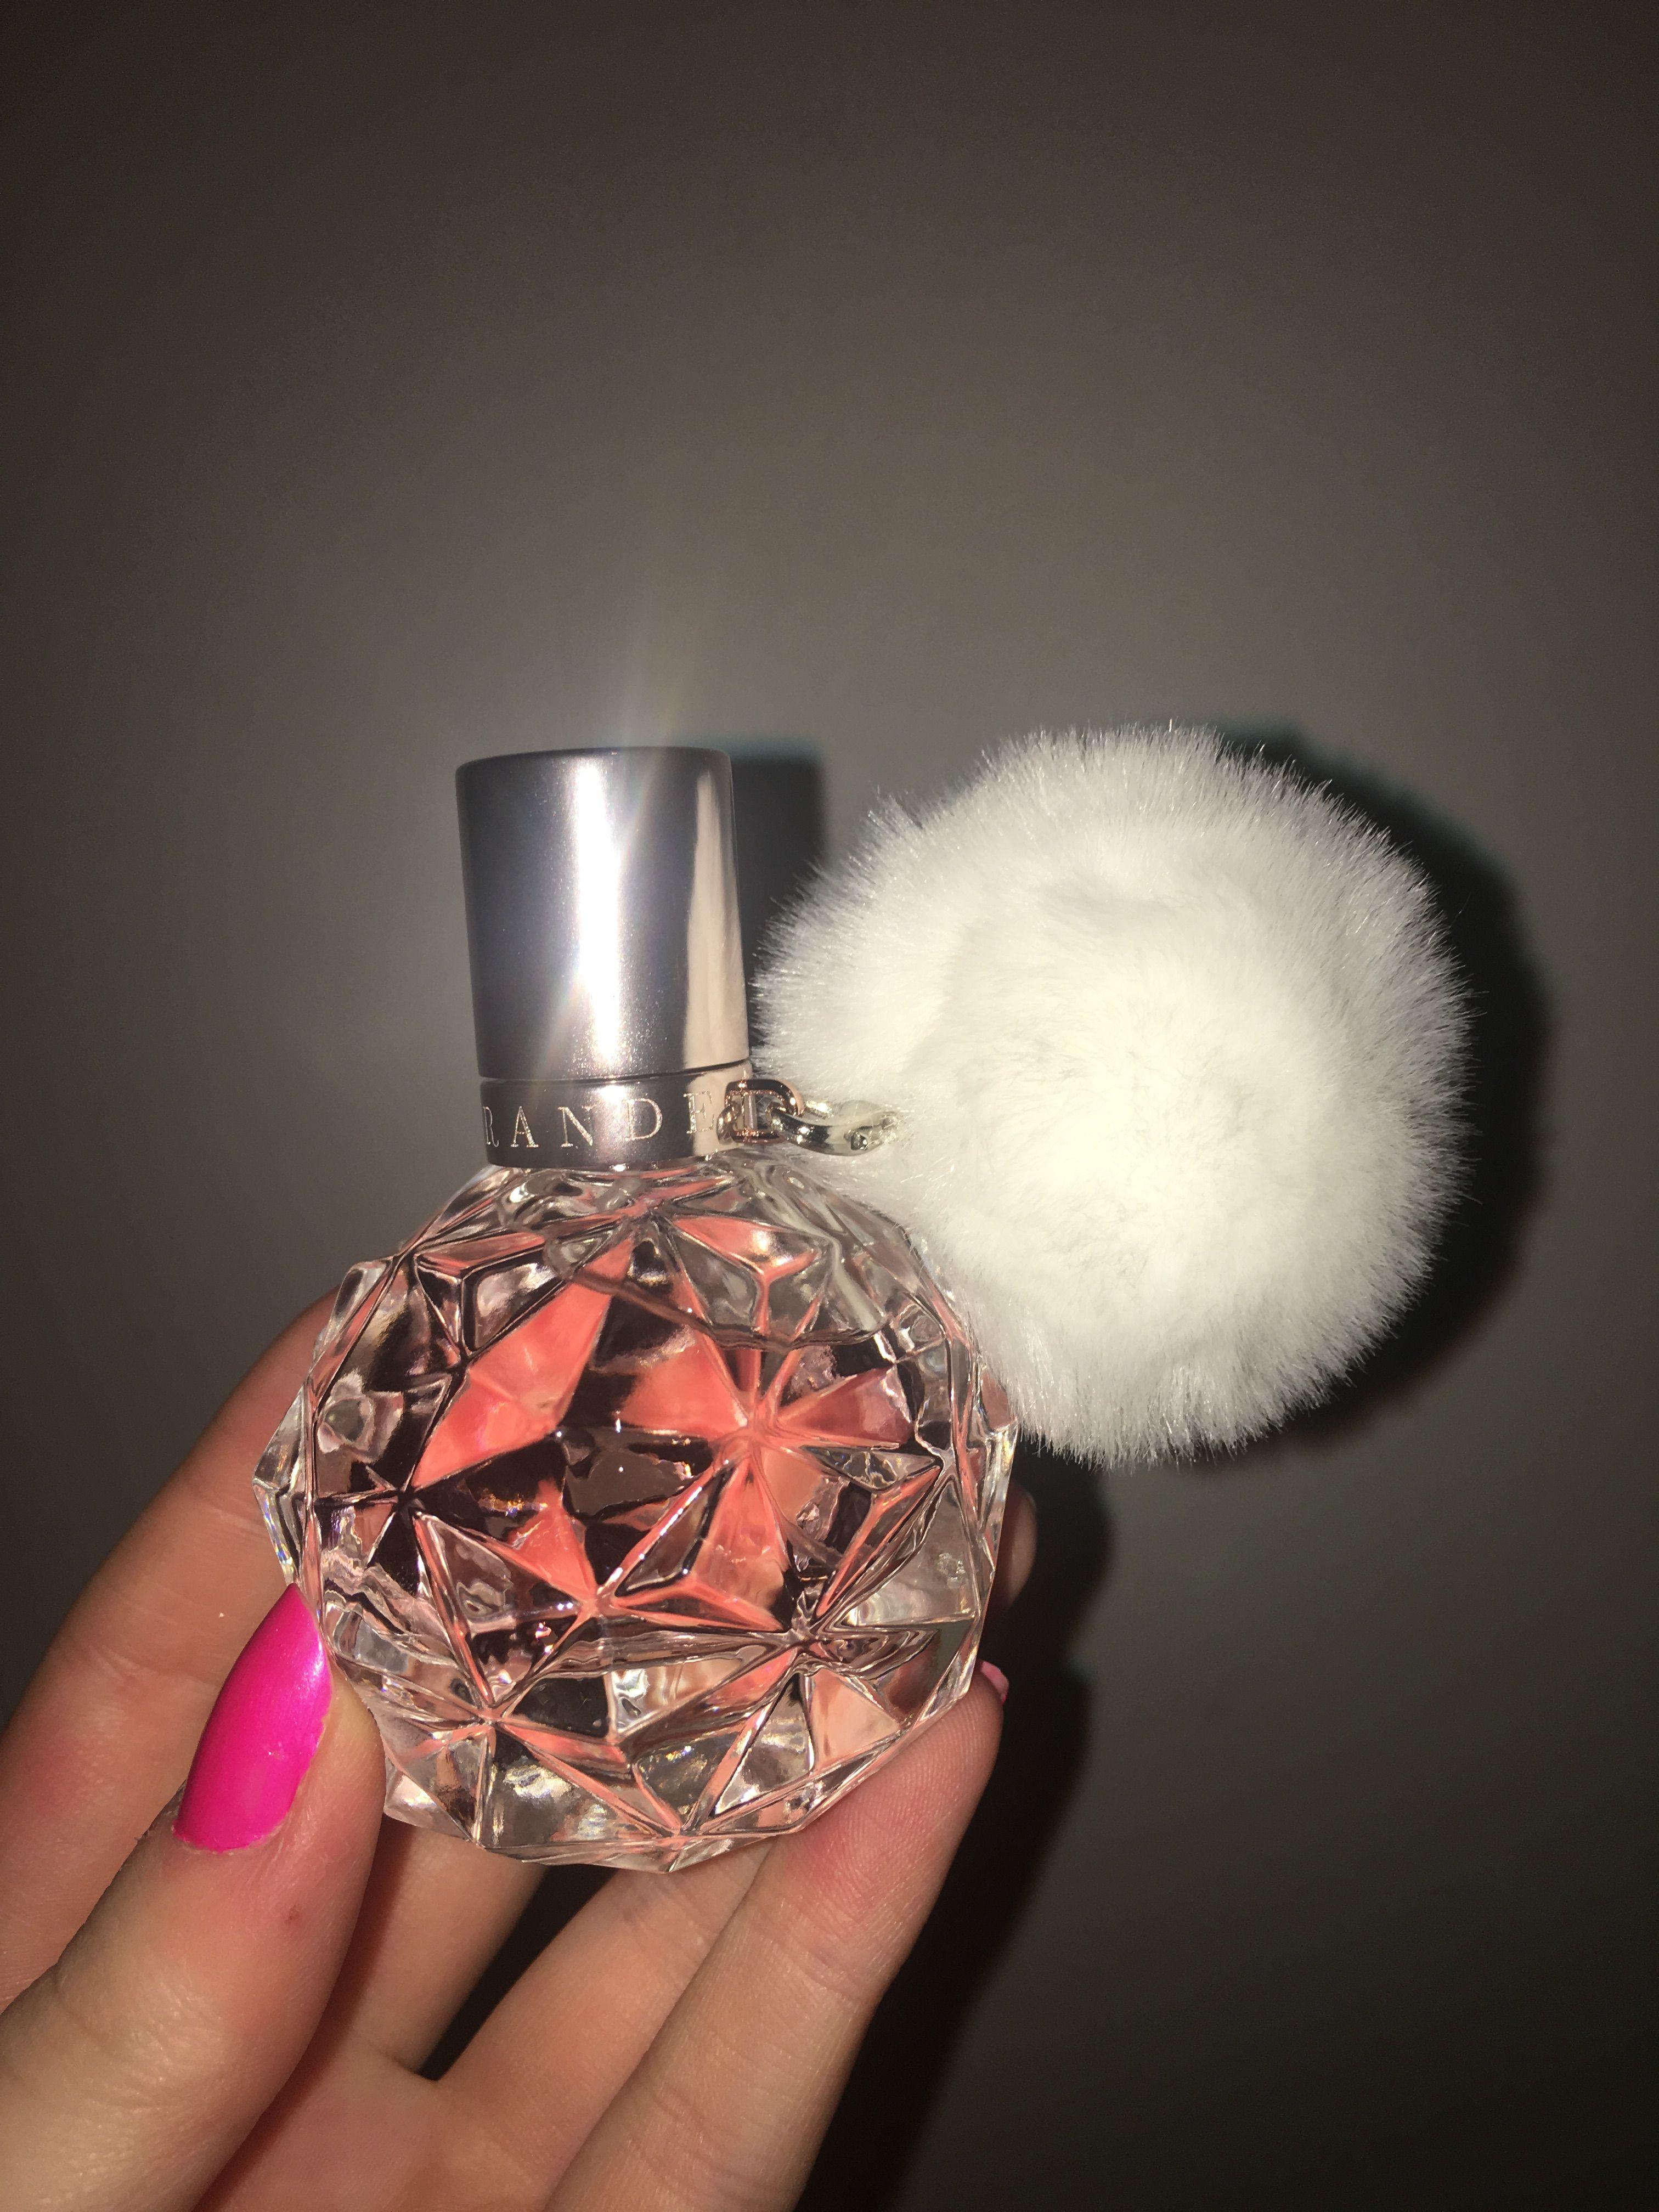 30ml Ariana Perfumearianagrandeariperfume Grande Ari 30ml Ariana